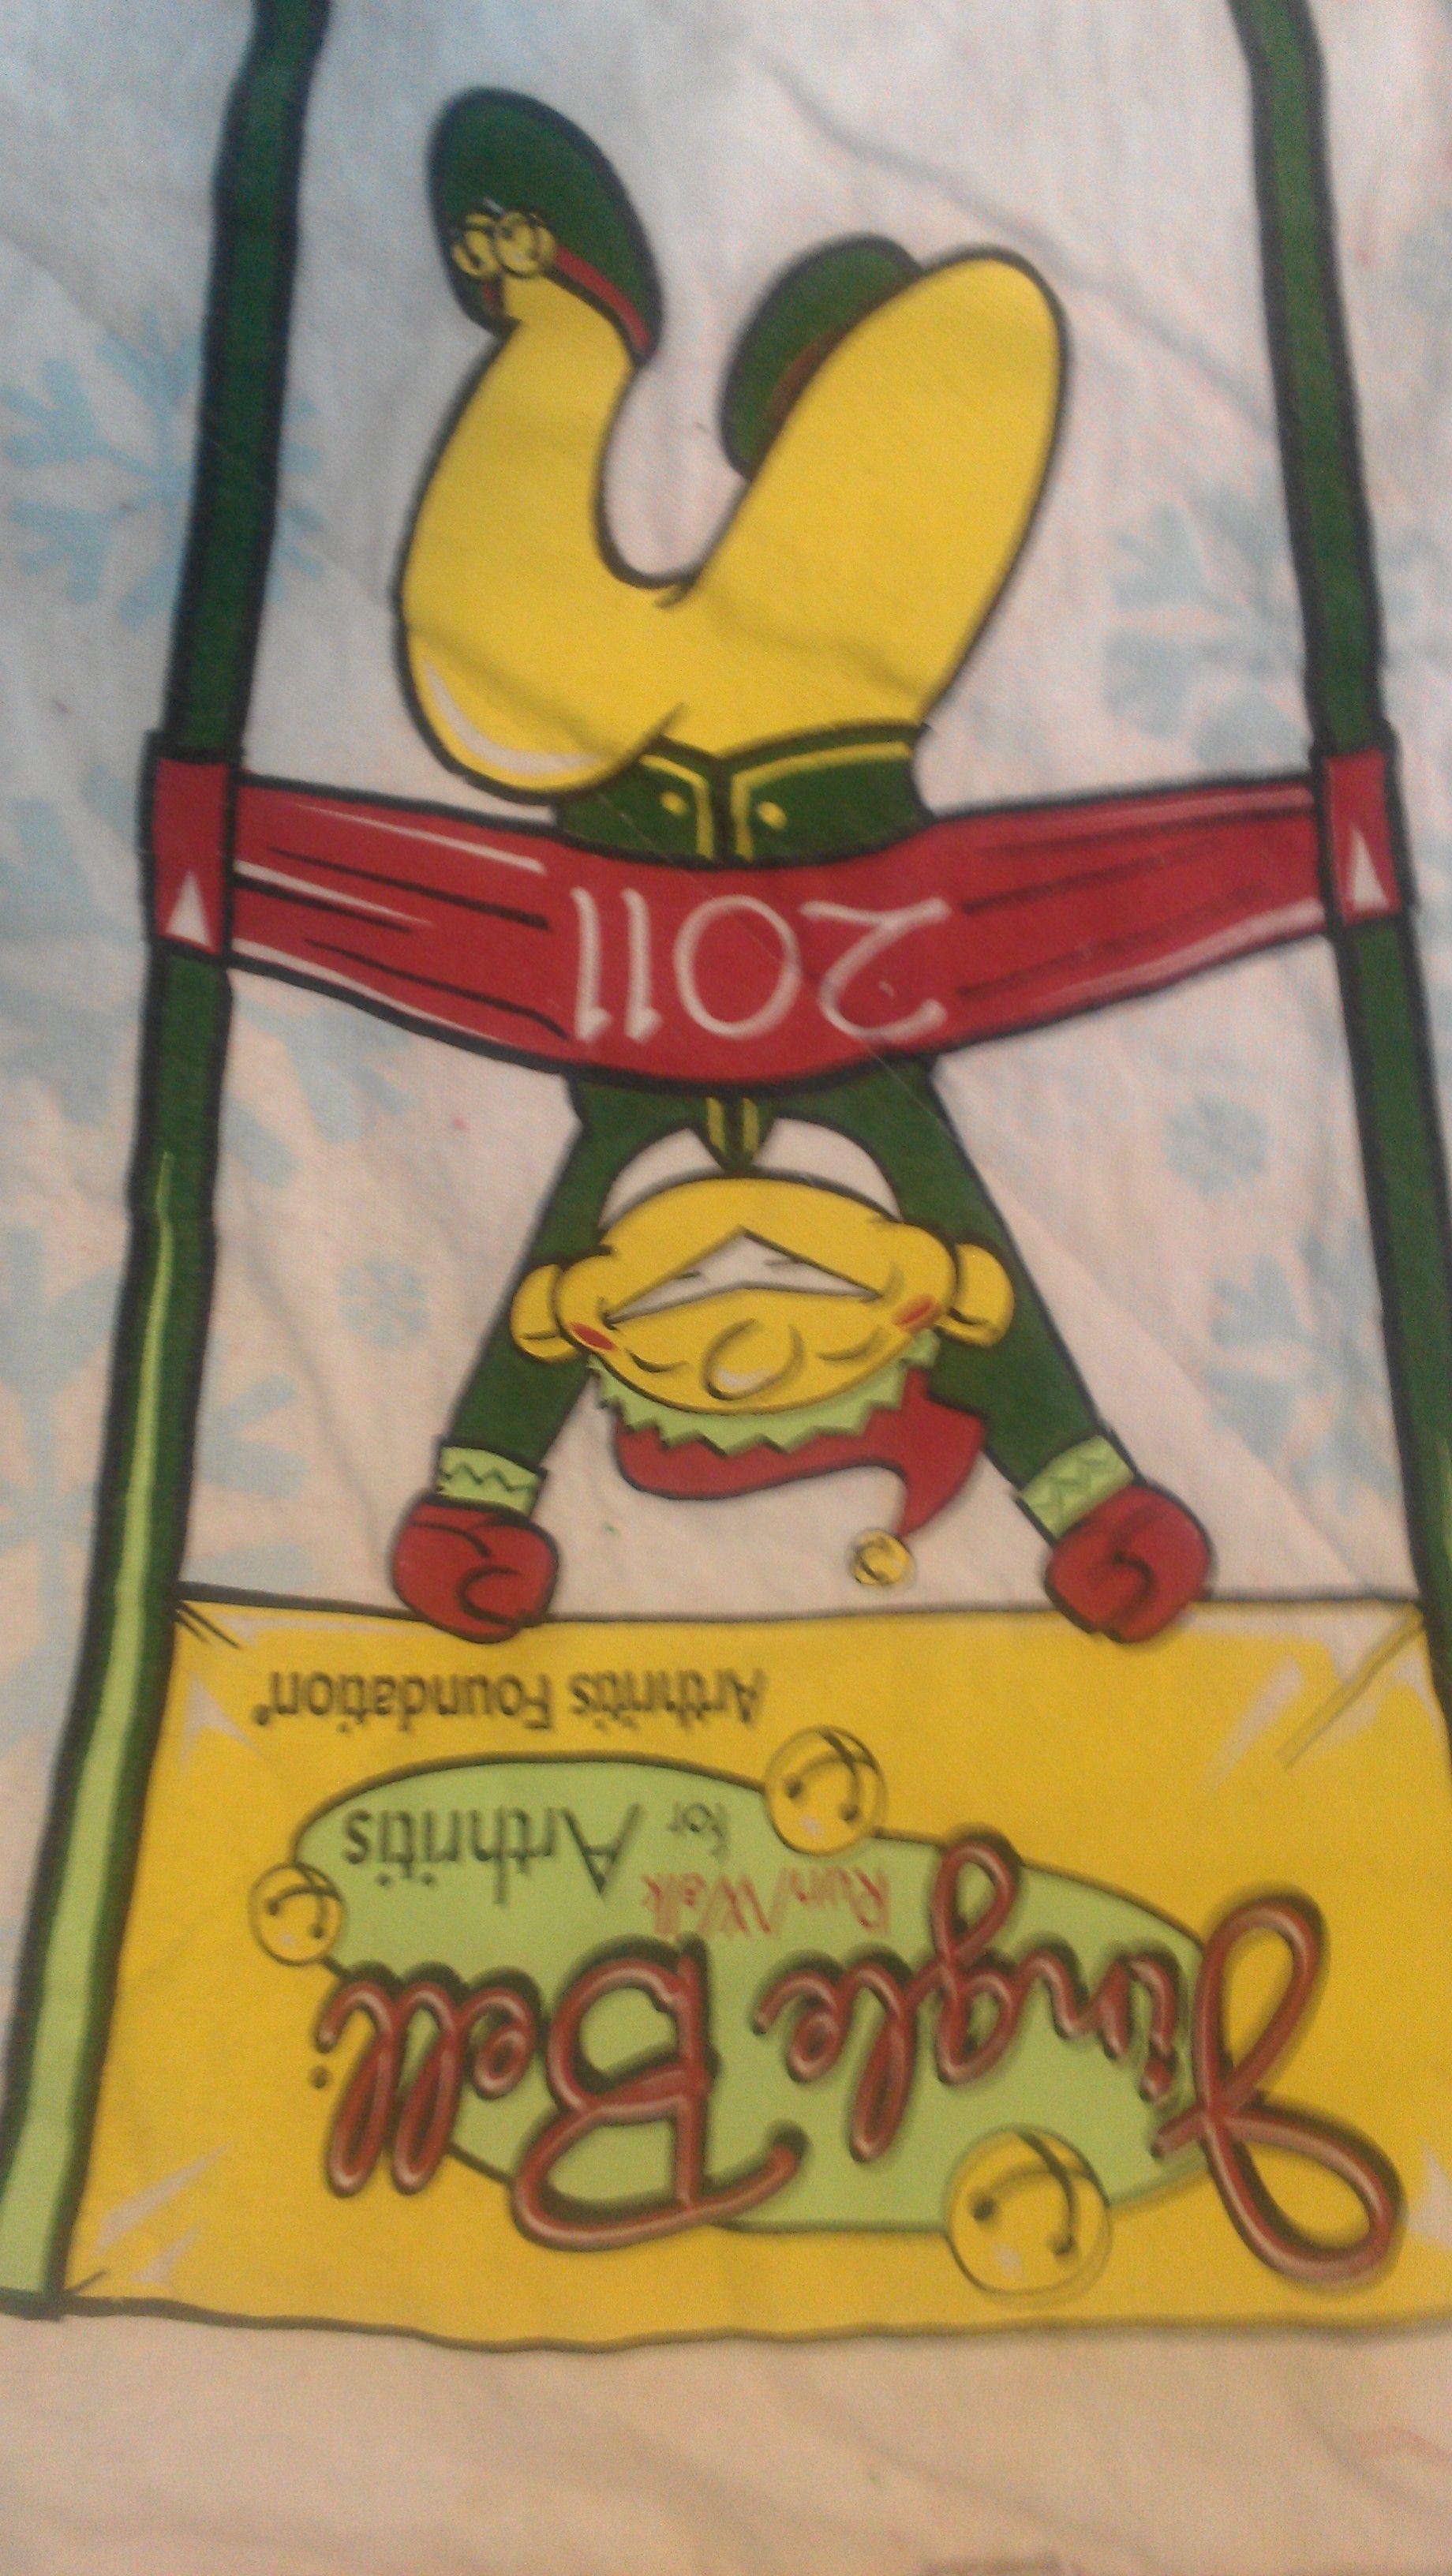 Quincy, Illinois Jingle Bell Run 5K, Dec. 2, 2011: Race ...